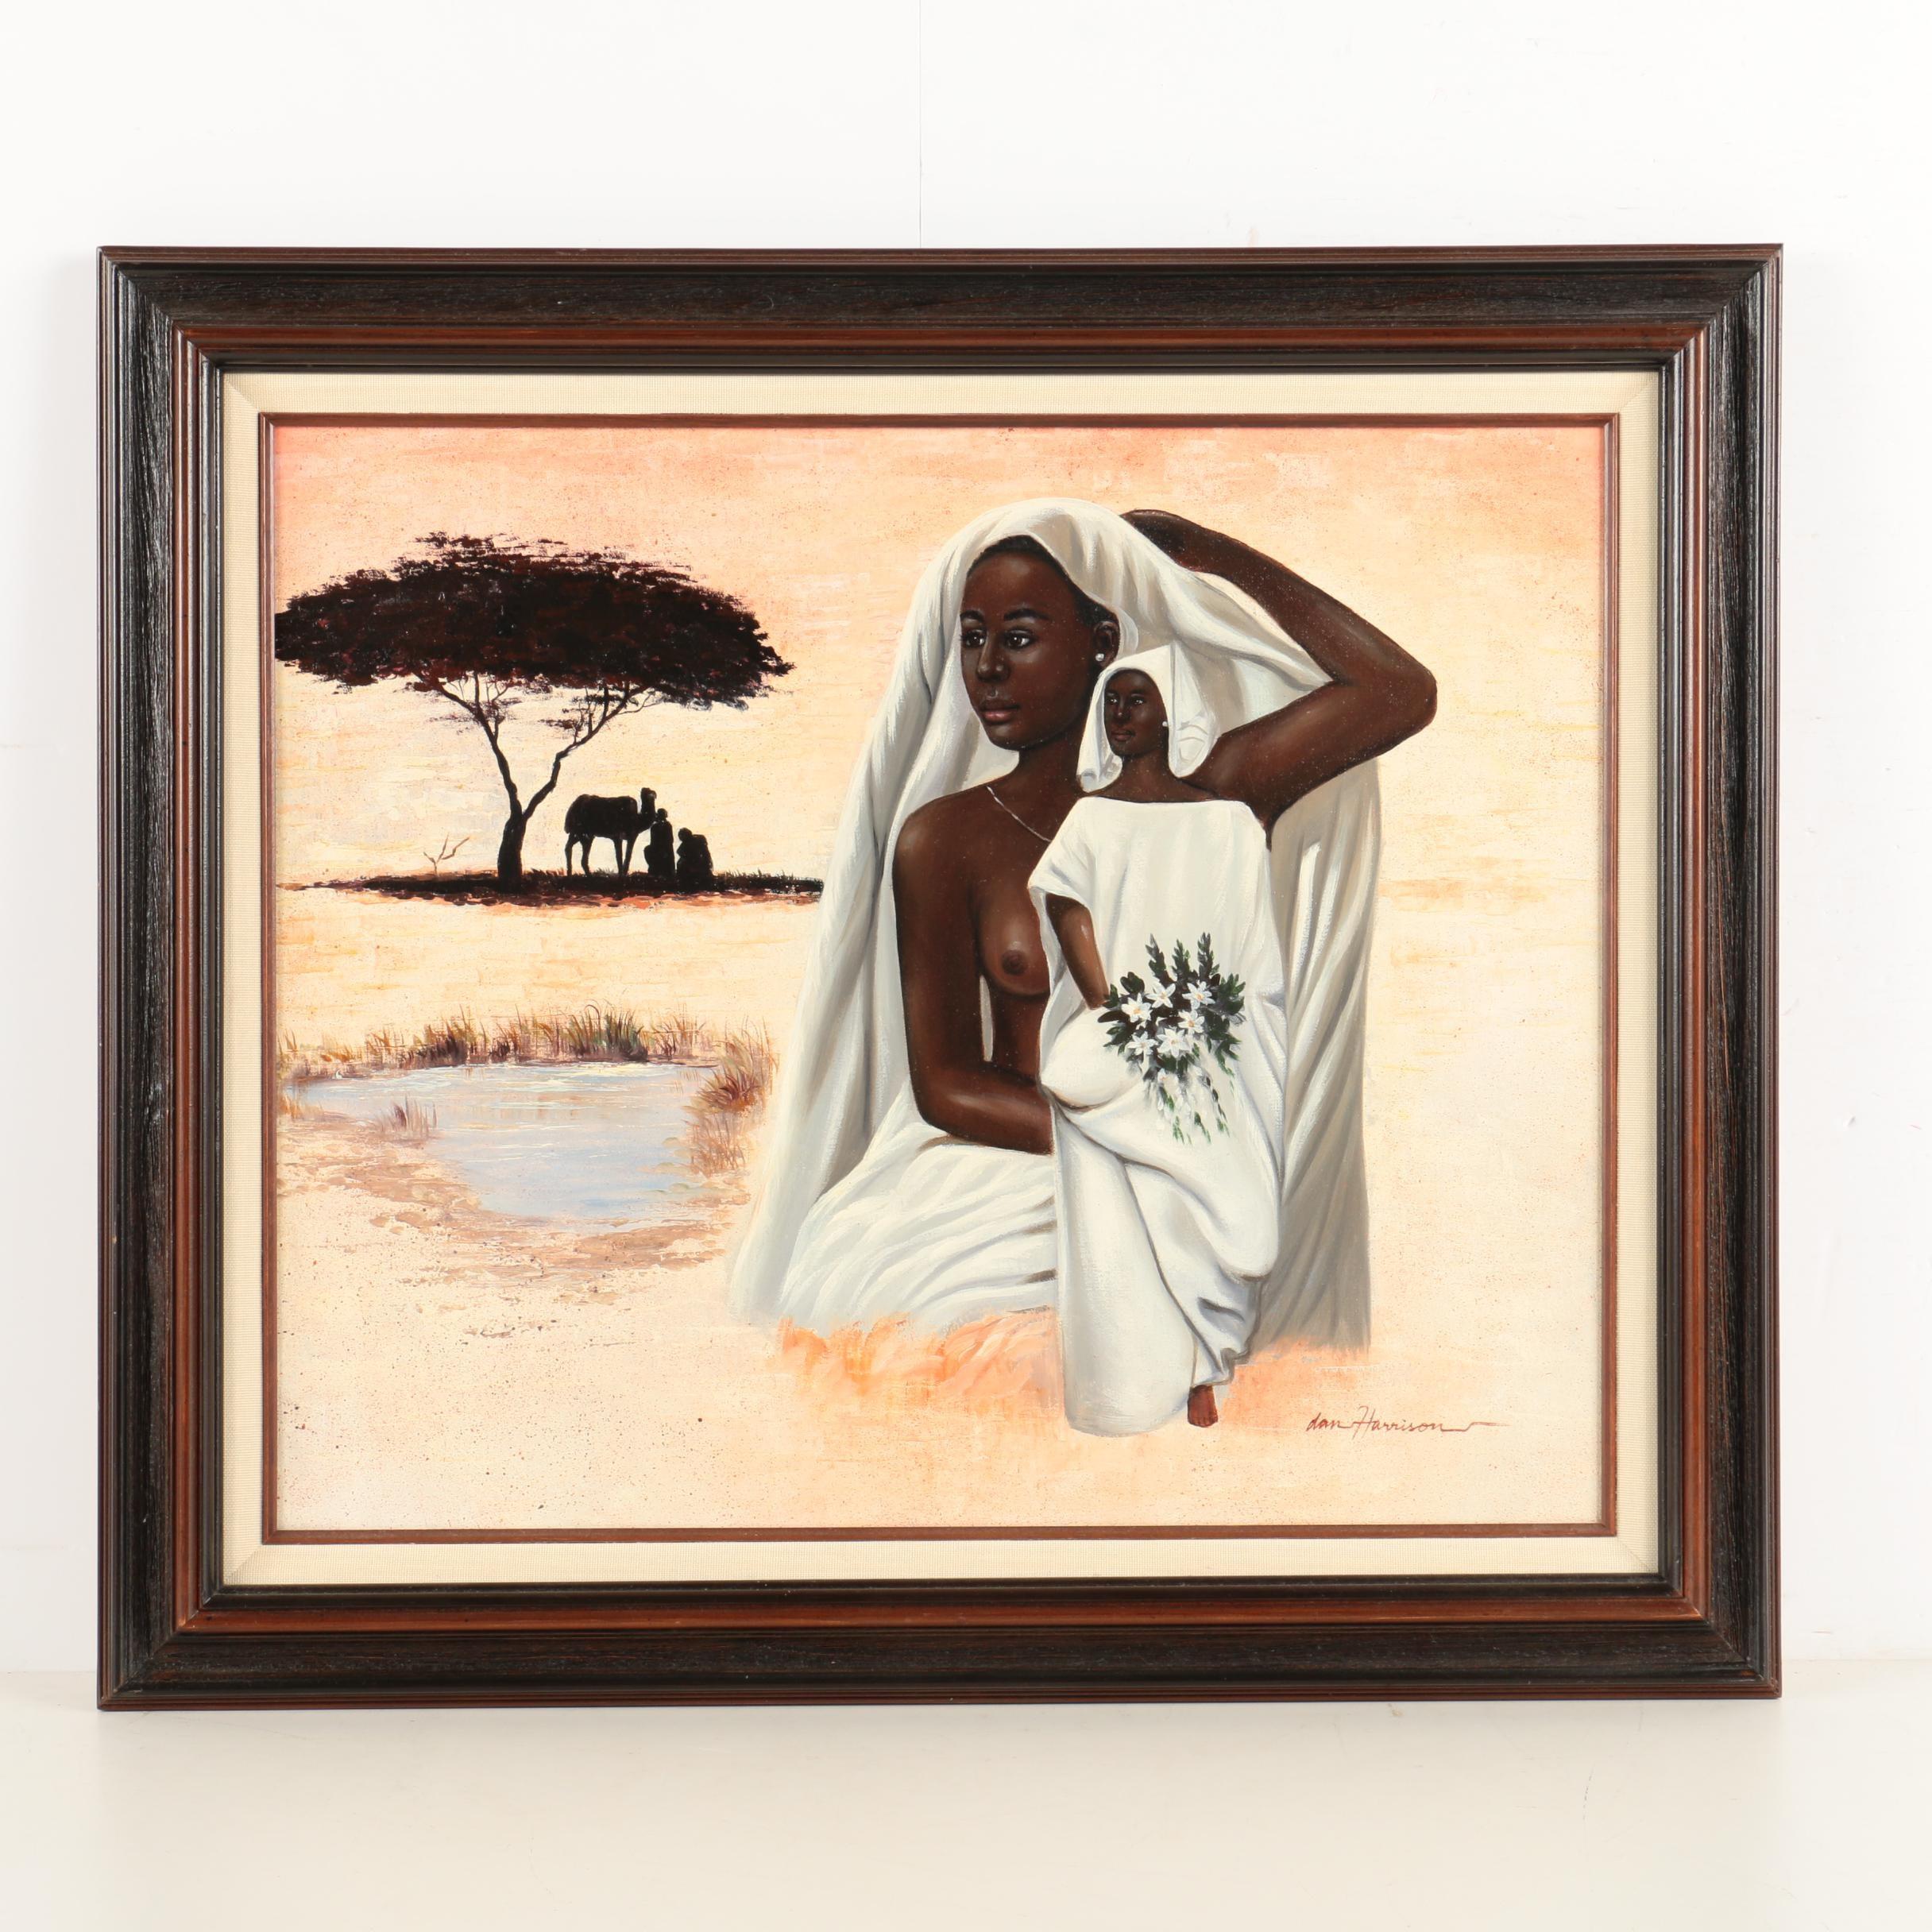 Dan Harrison Oil On Canvas Painting of a Women in a Desert Setting